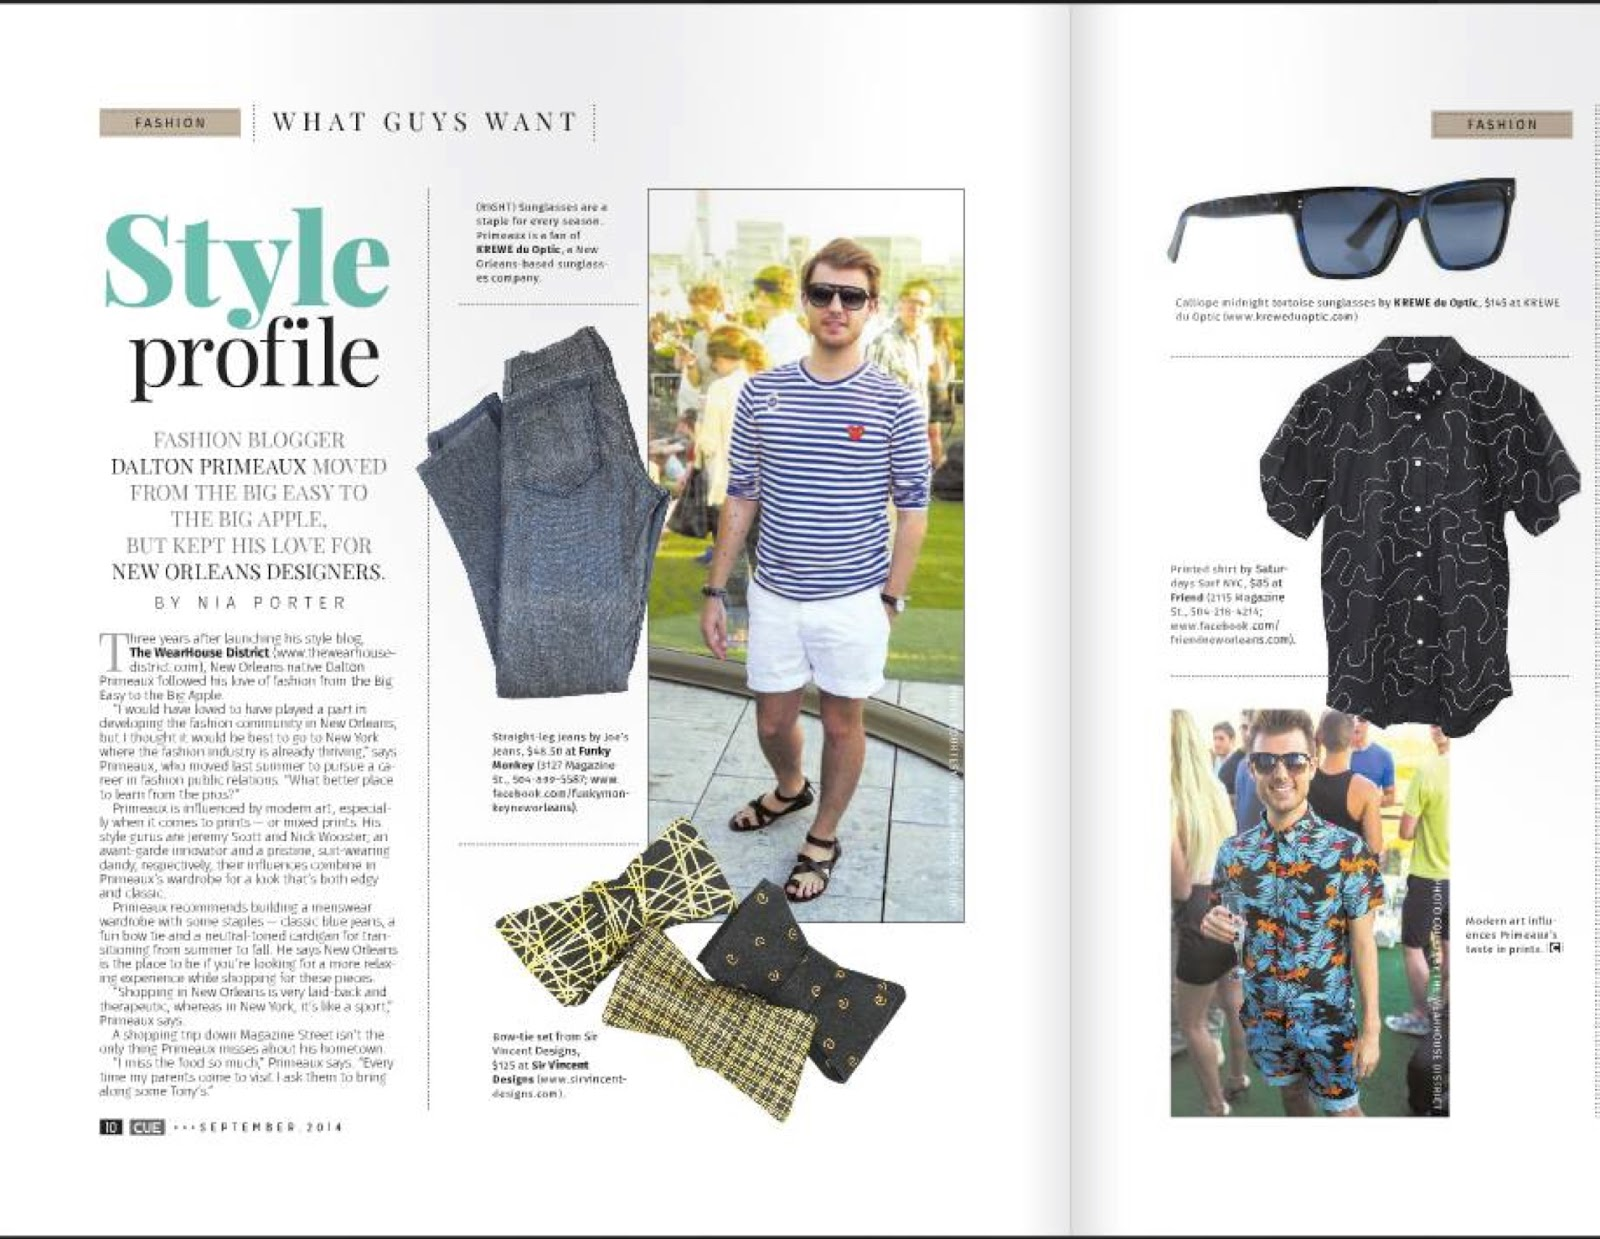 Gambit CUE Magazine Press